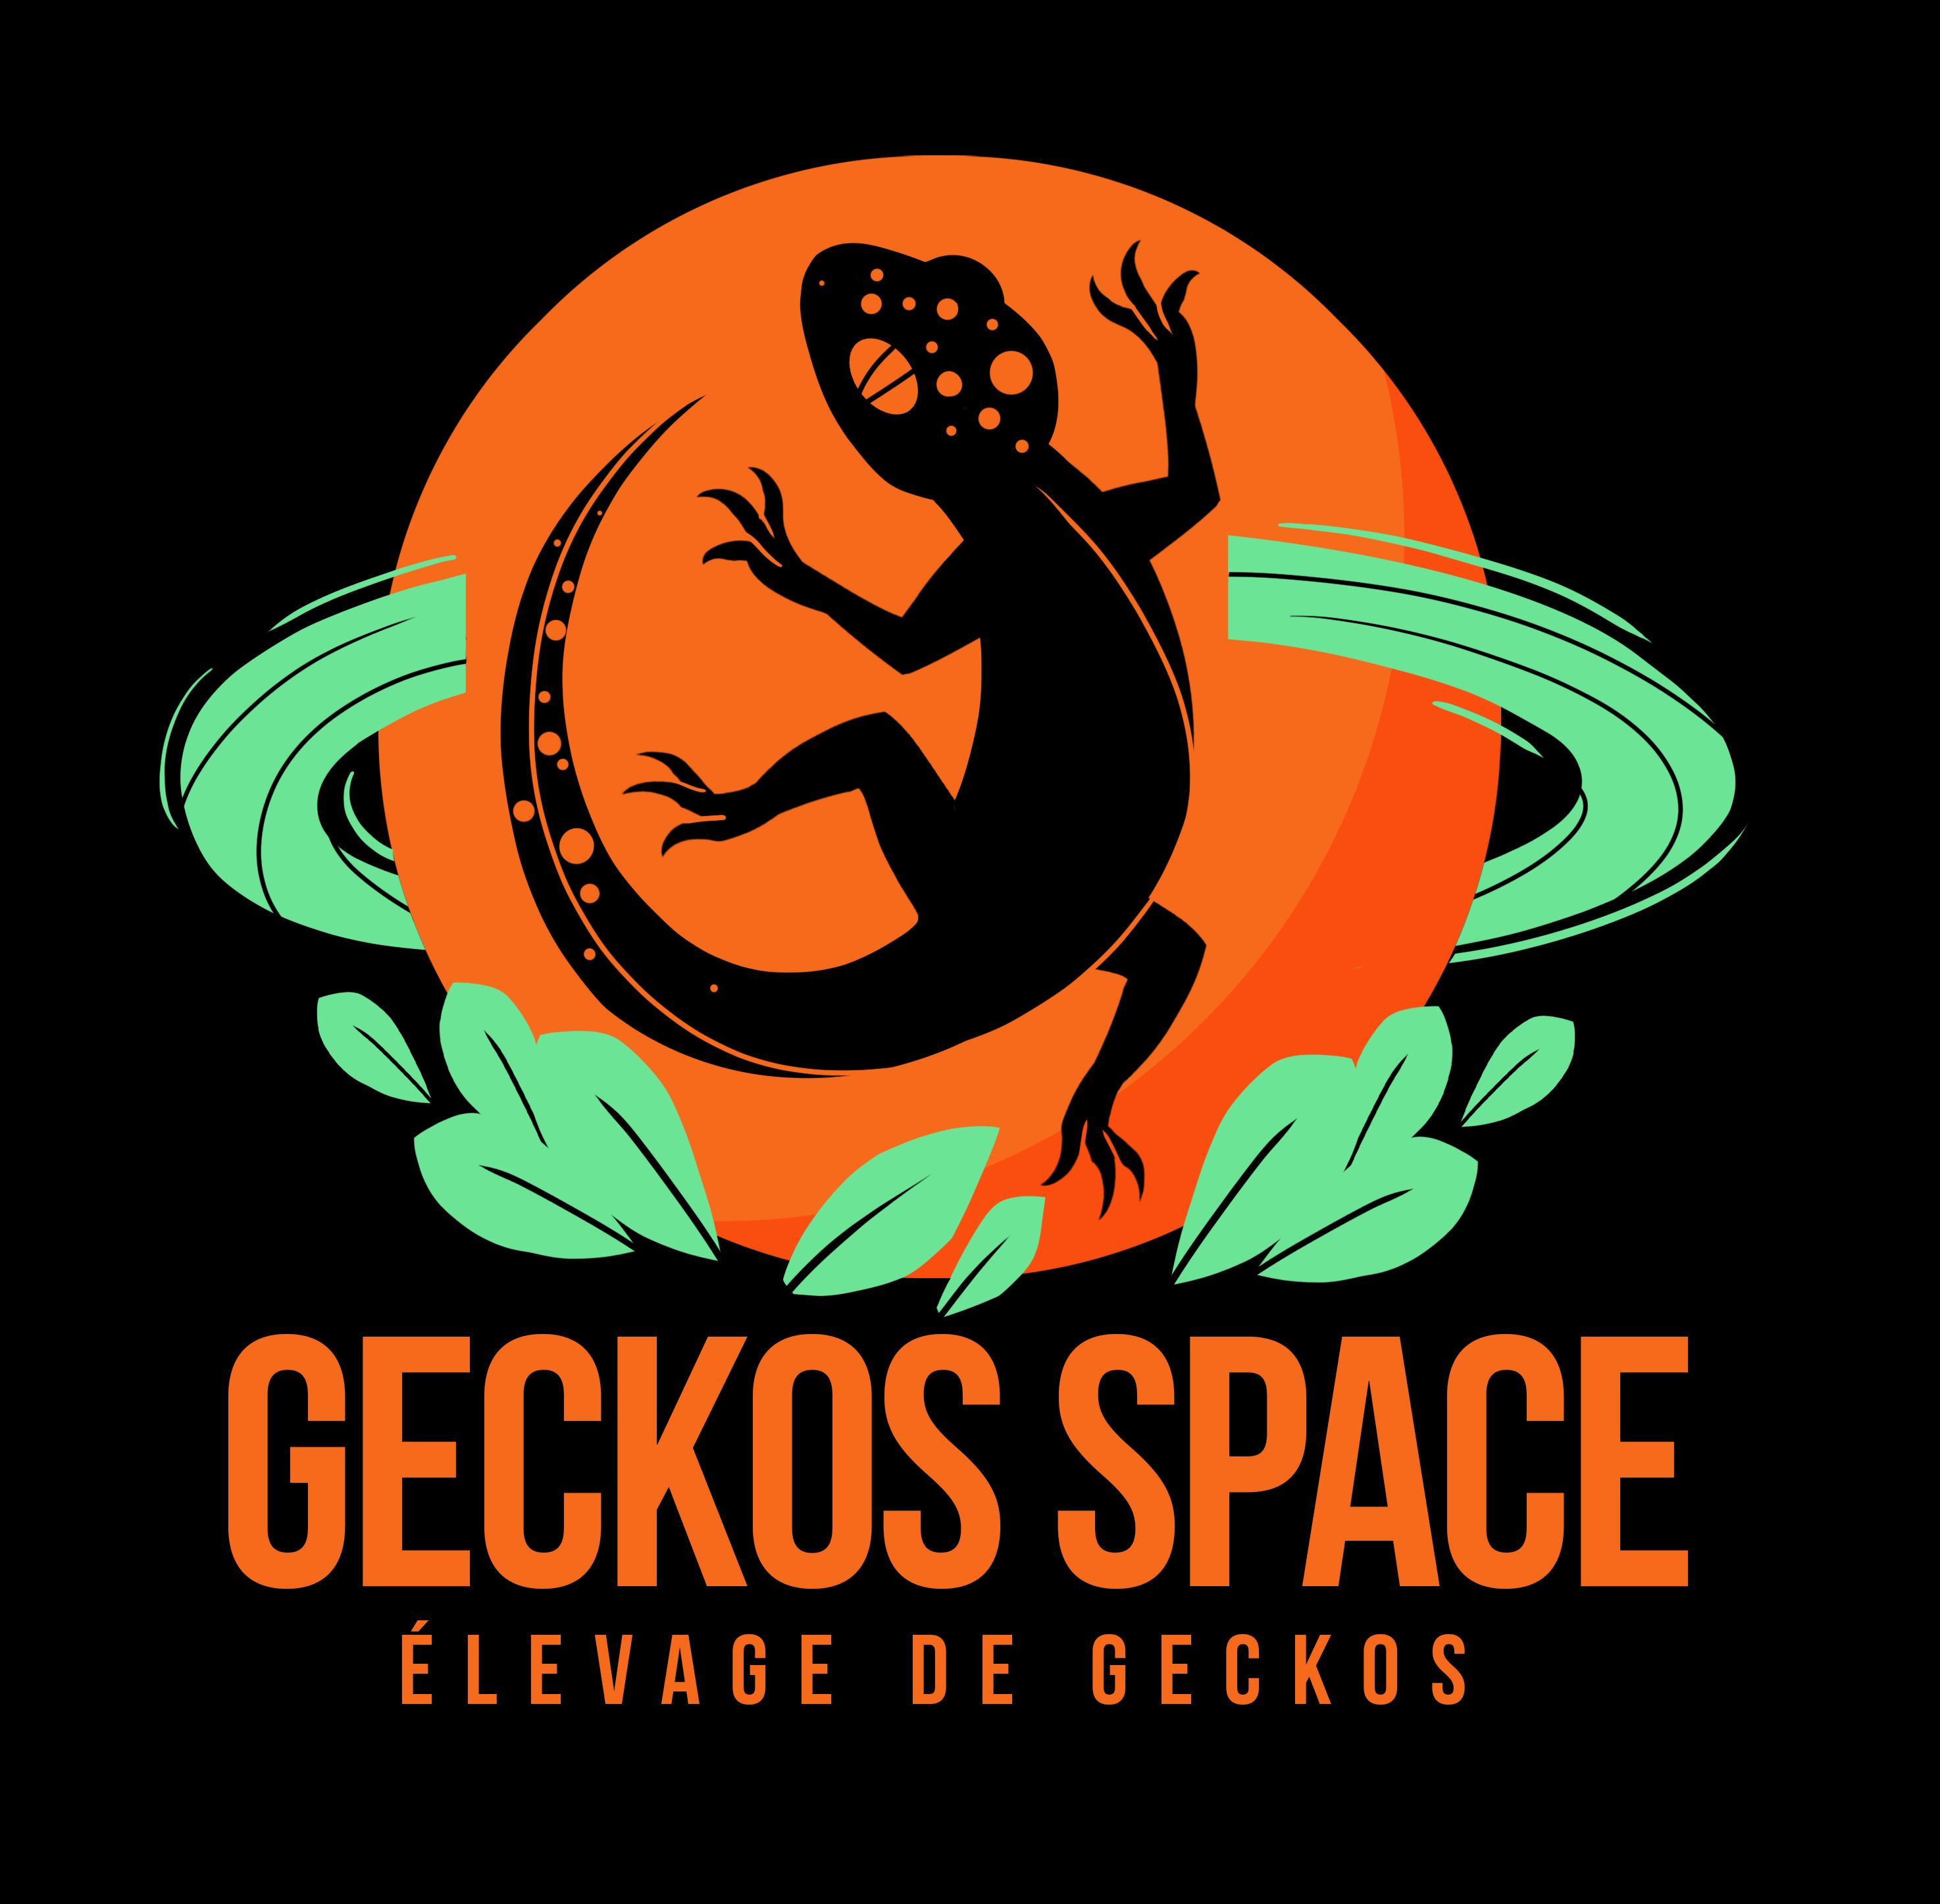 Logo_Geckos_Space_fond-noir